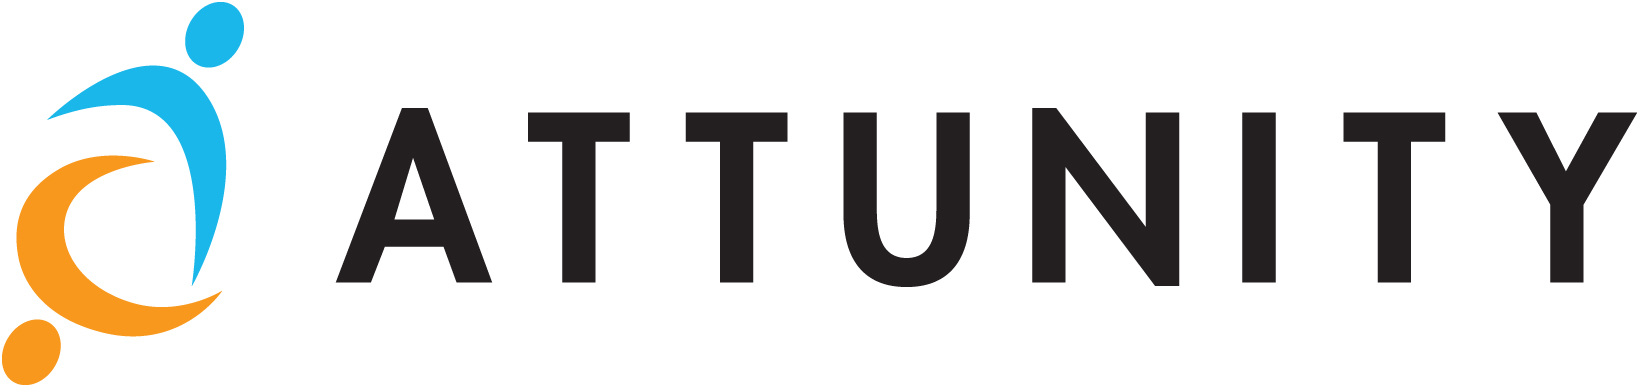 Attunity-Logo-ASUG